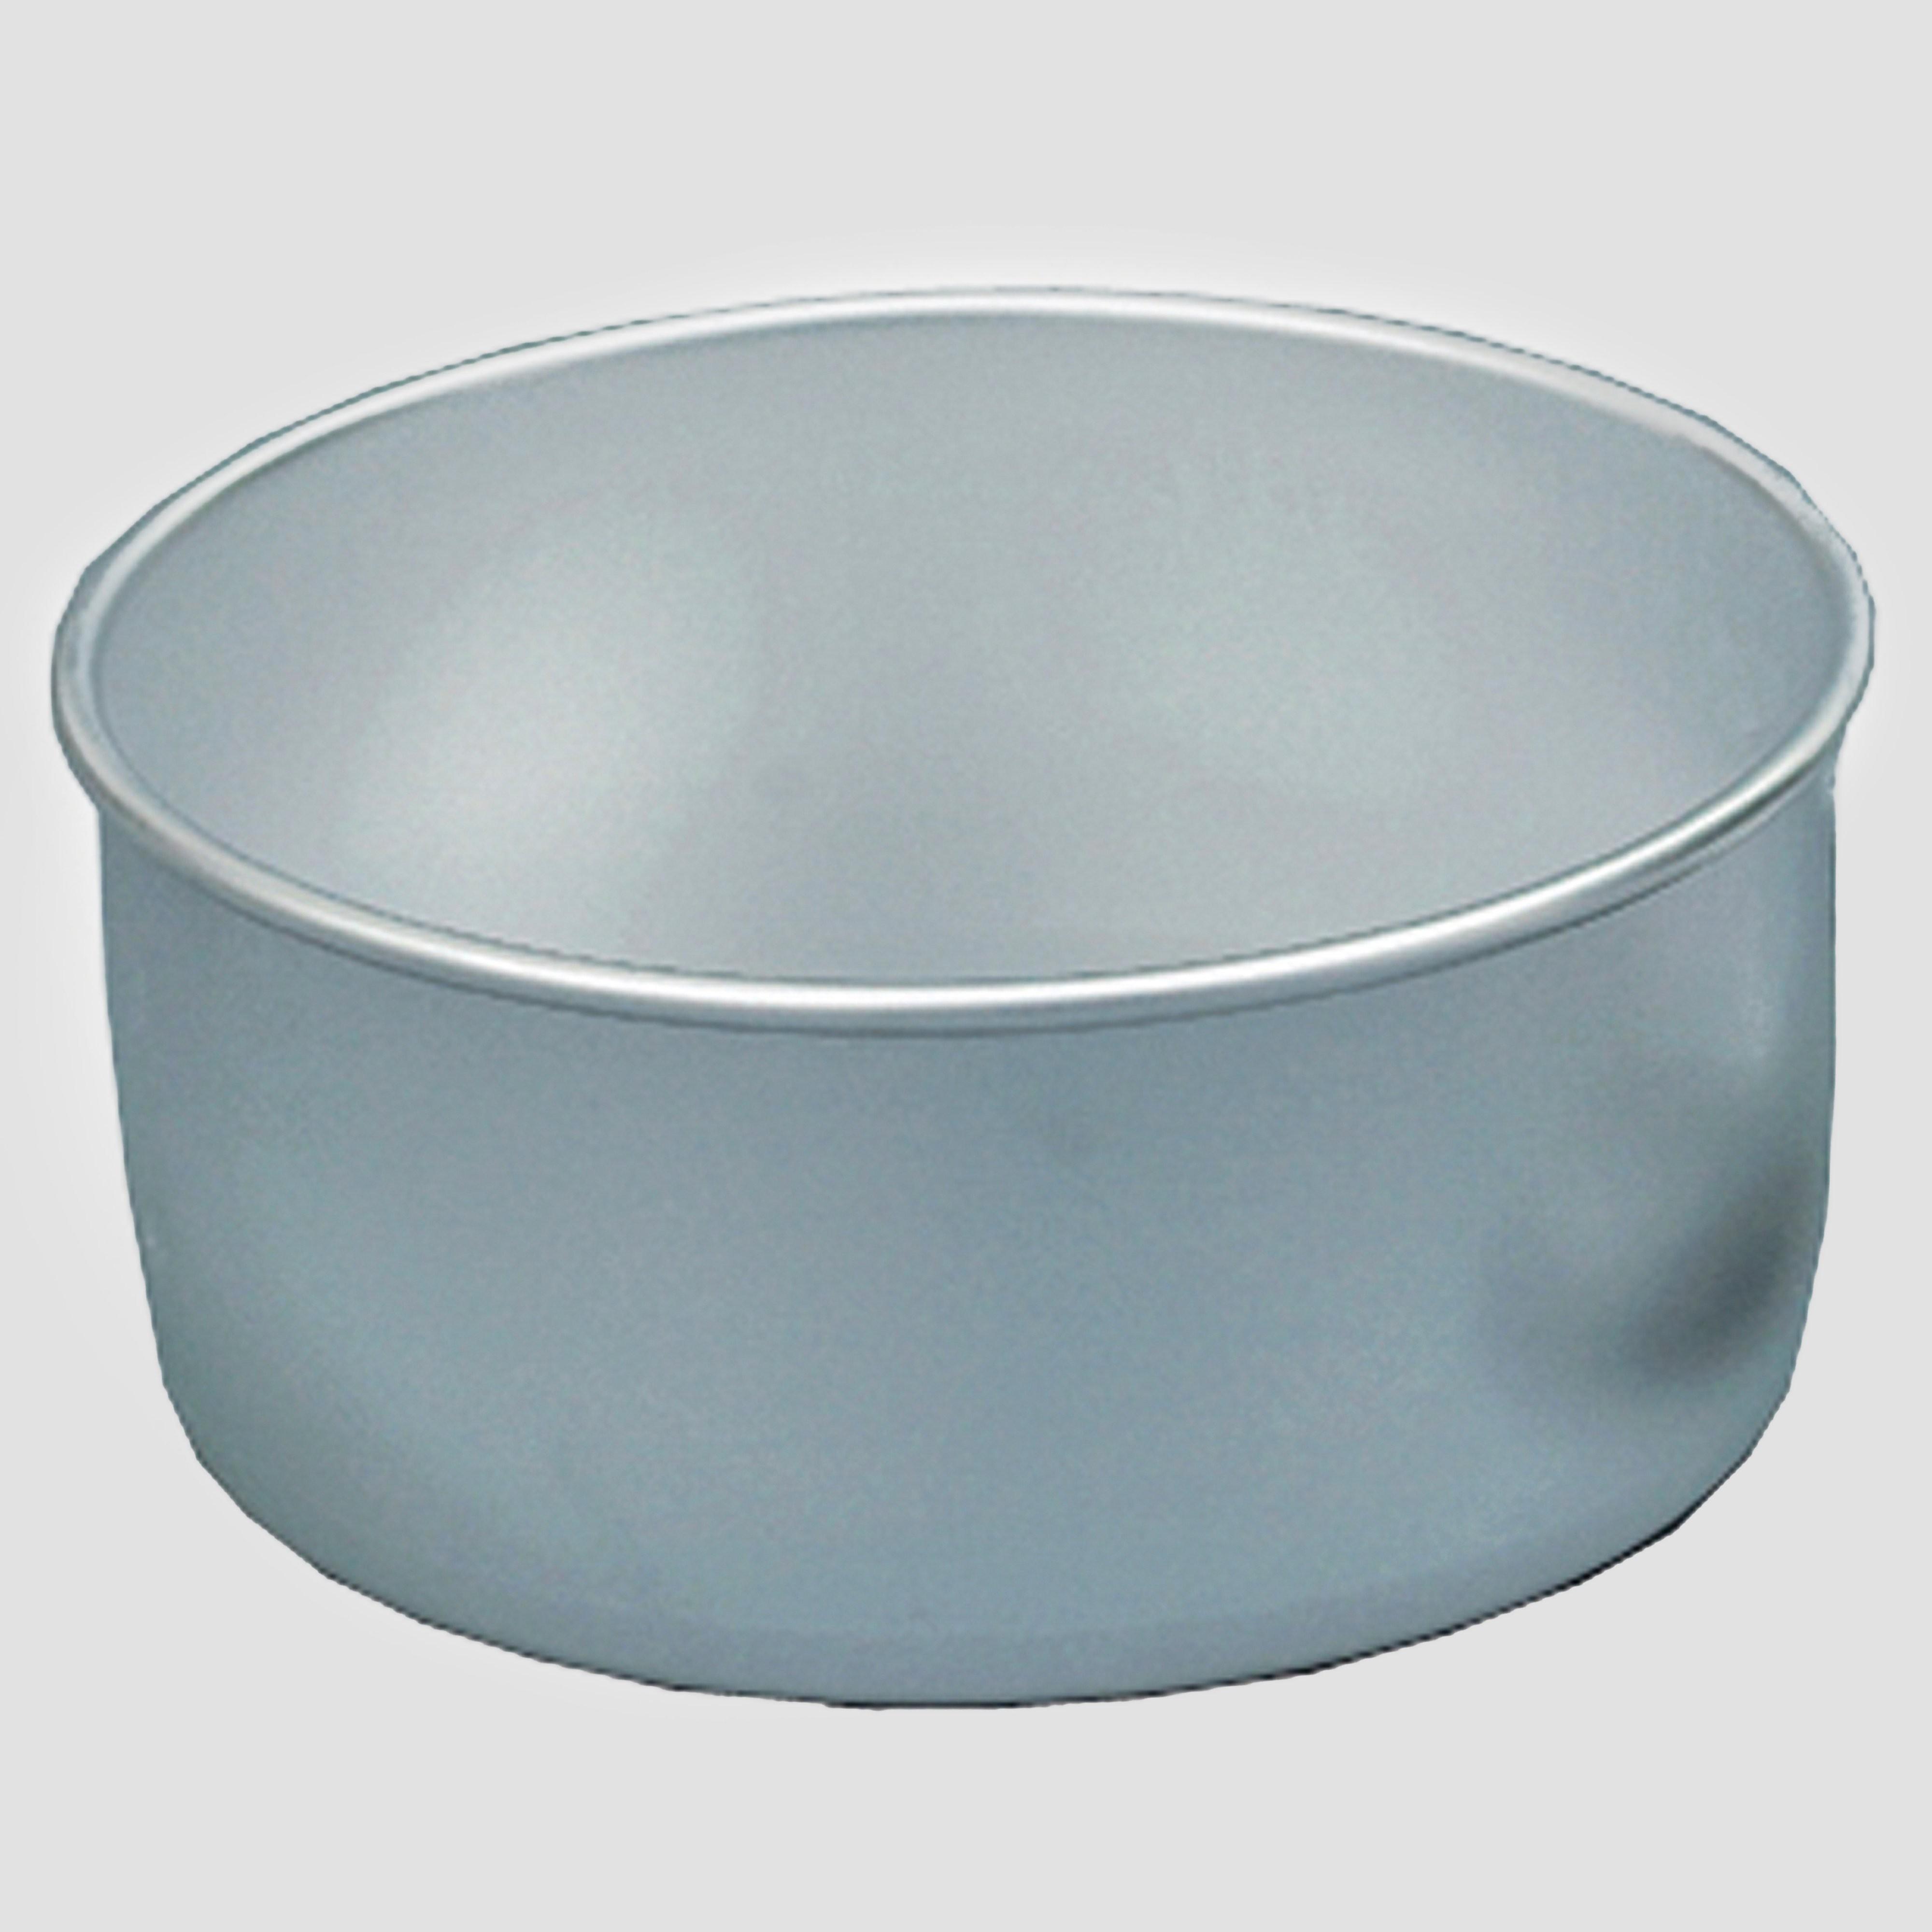 TRANGIA Trangia 1.75l Outer Aluminium Saucepan